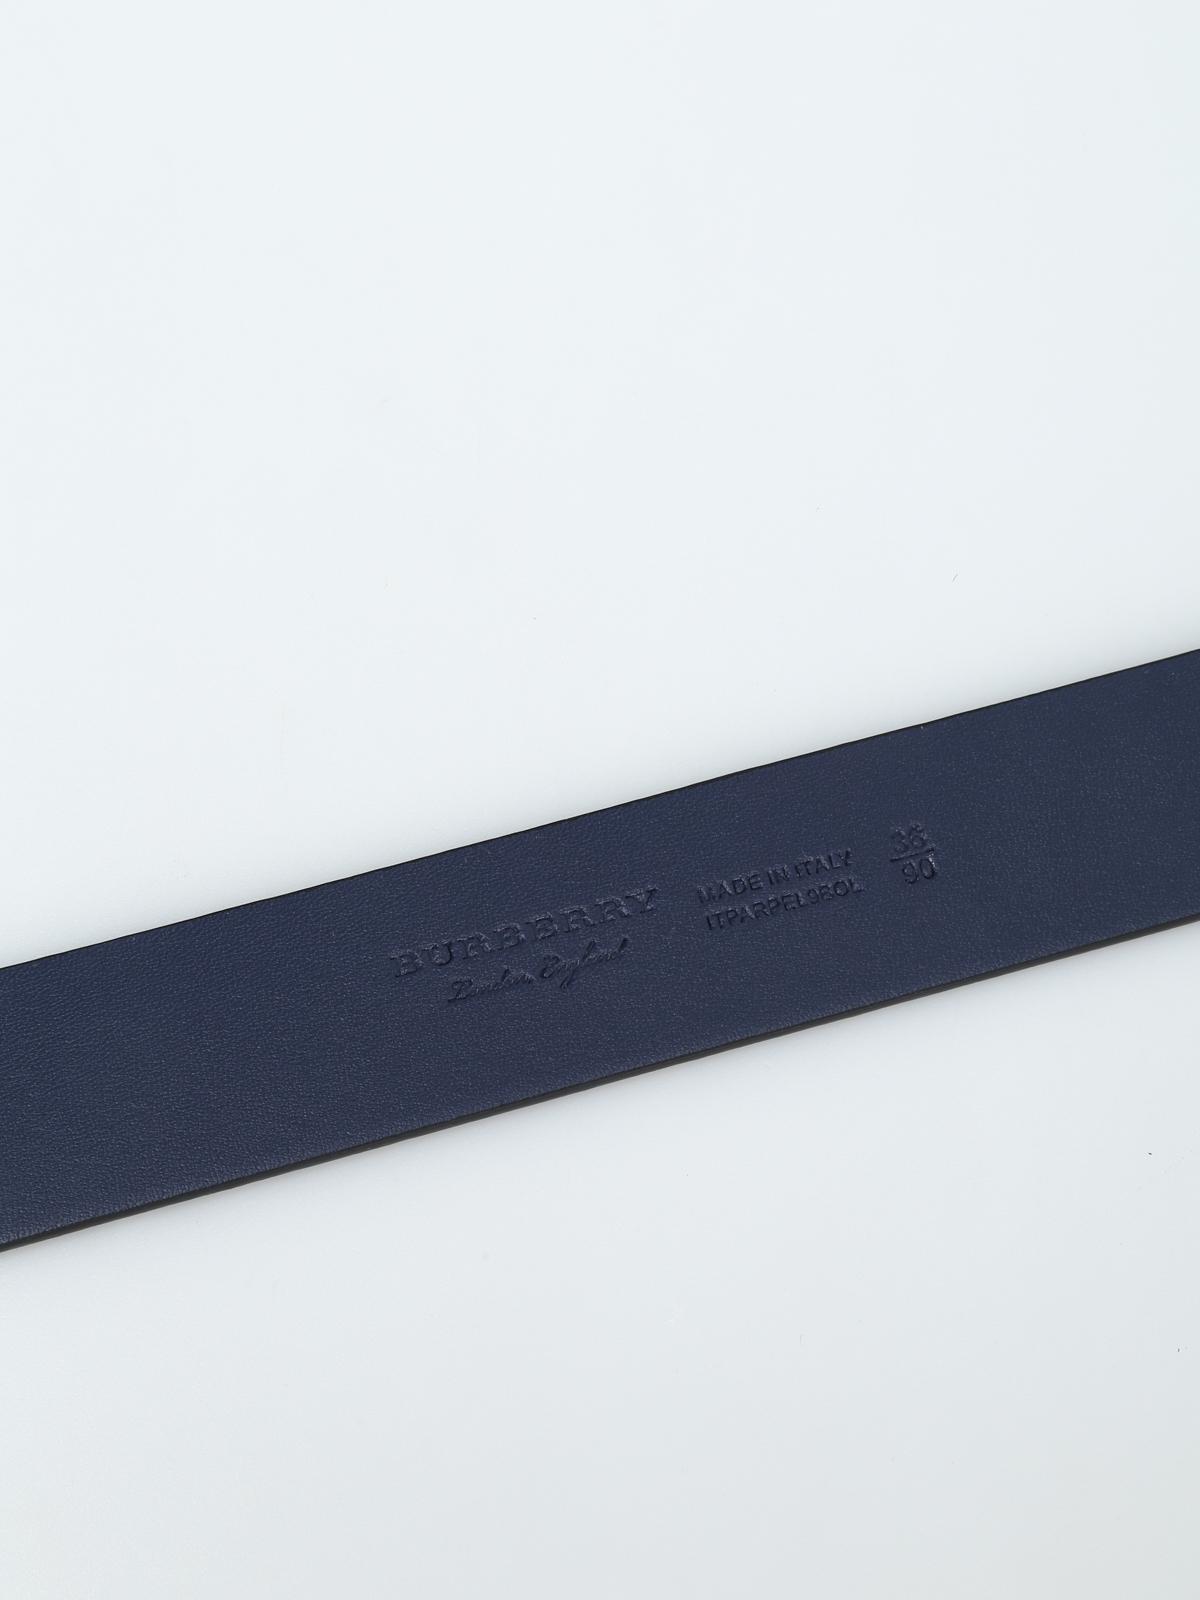 42ddf32a66e9 iKRIX BURBERRY  belts - Vintage check and graffiti print leather belt